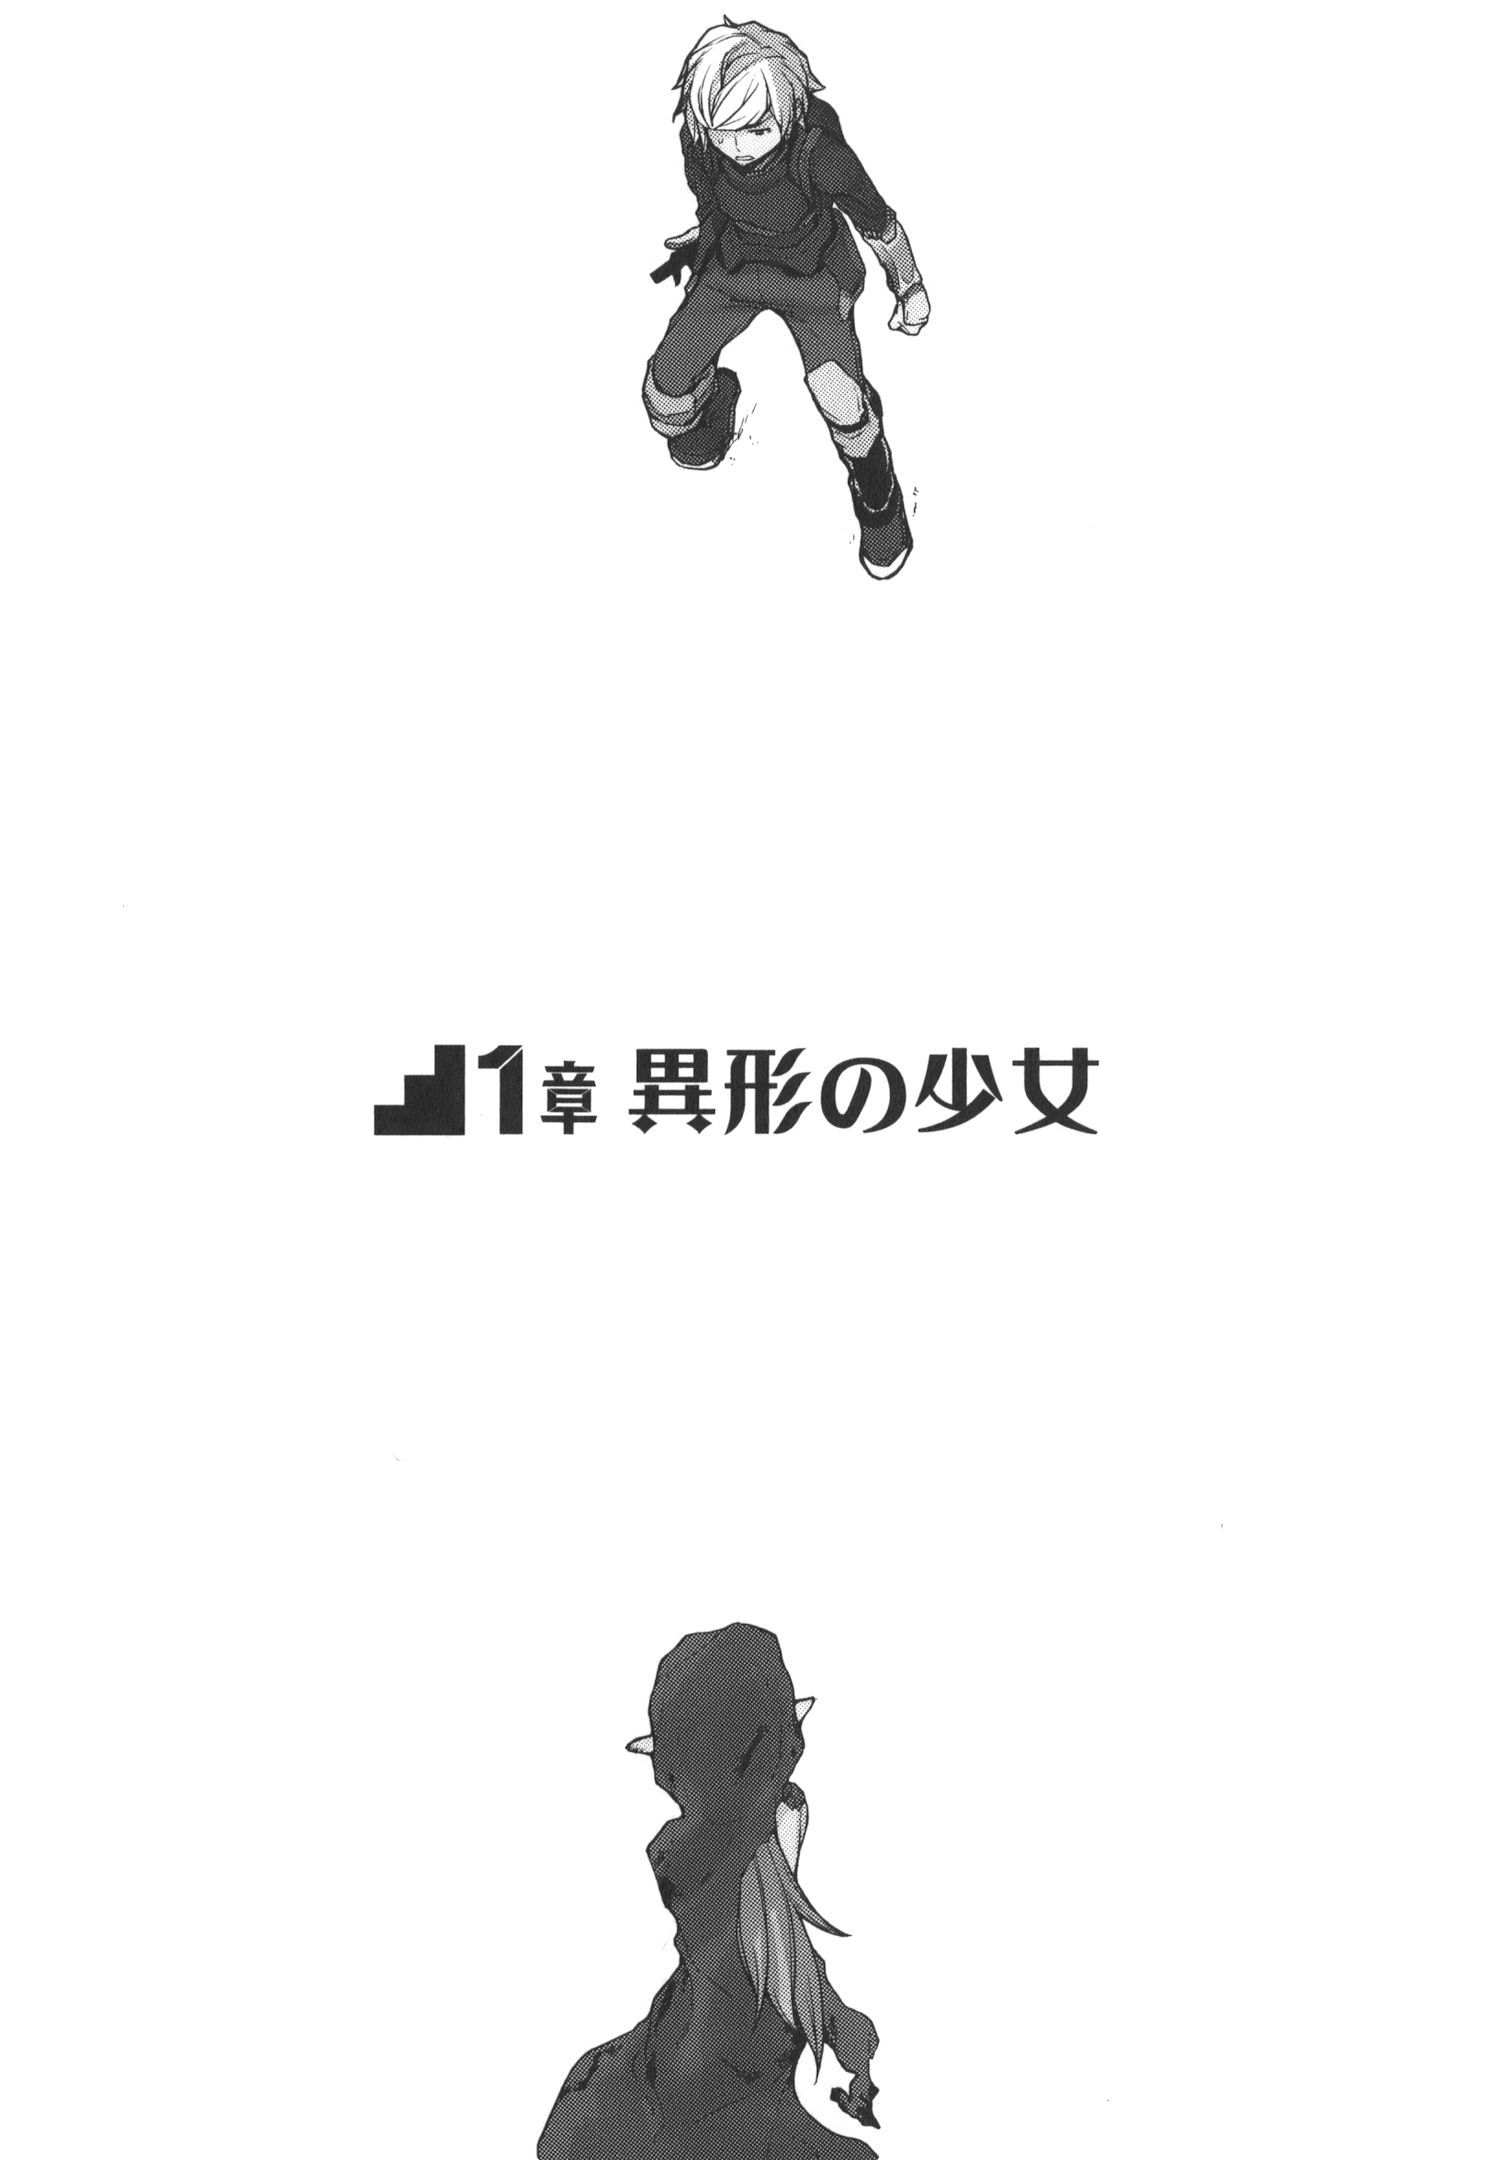 BZland International Manga Website [Suzuhito Yasuda